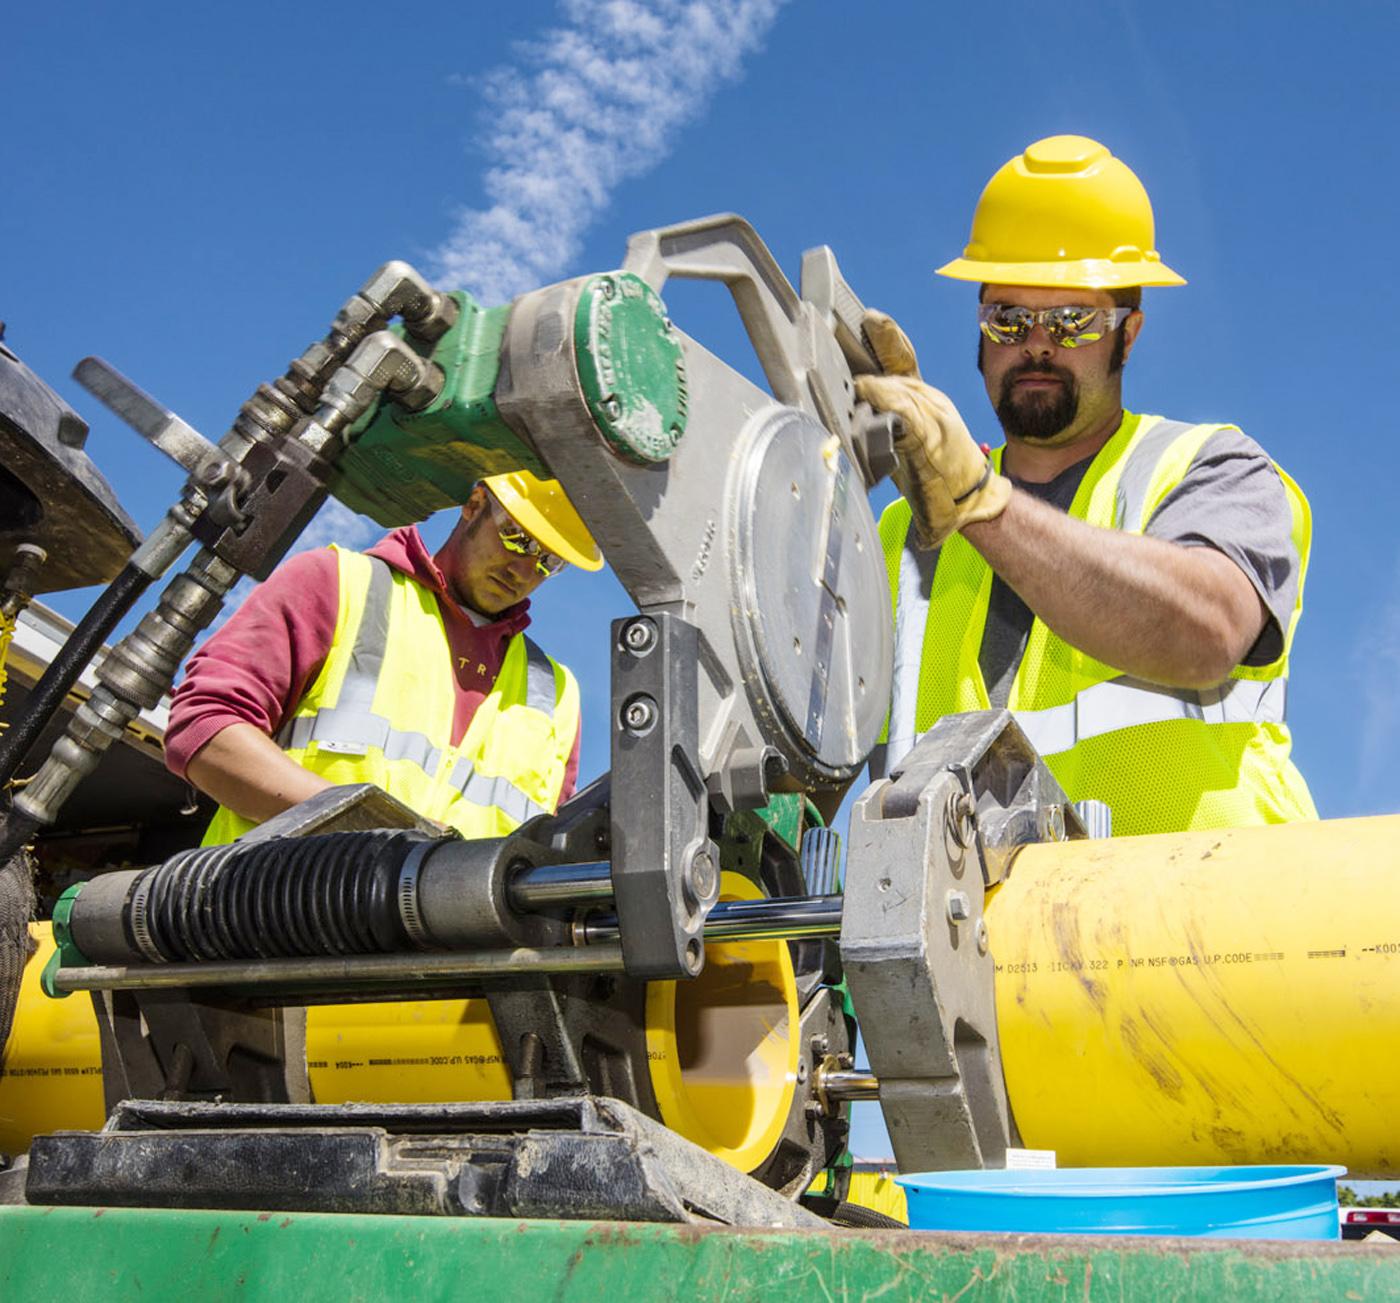 Laborer's Apprenticeship Program